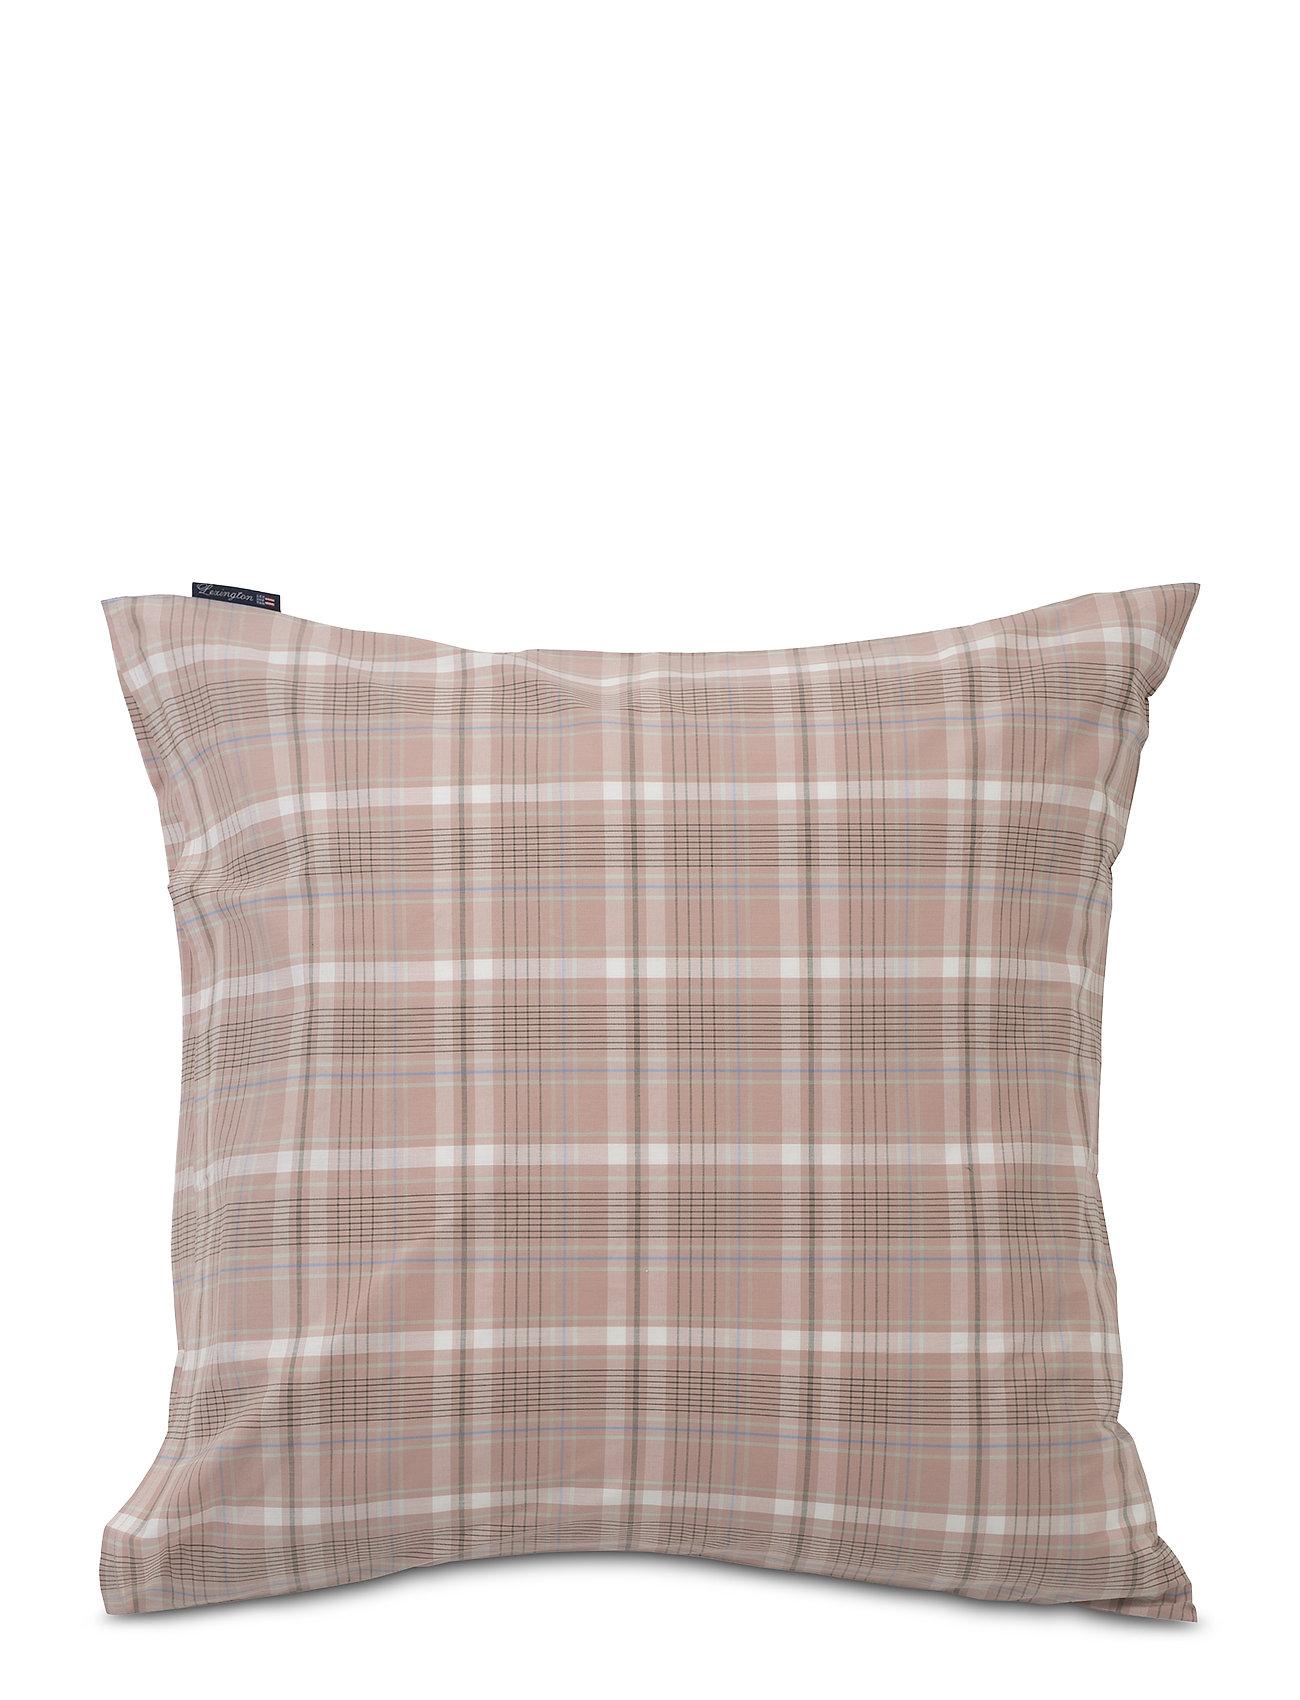 Lexington Home Pink Checked Madras Poplin Pillowcase - WHITE/PINK